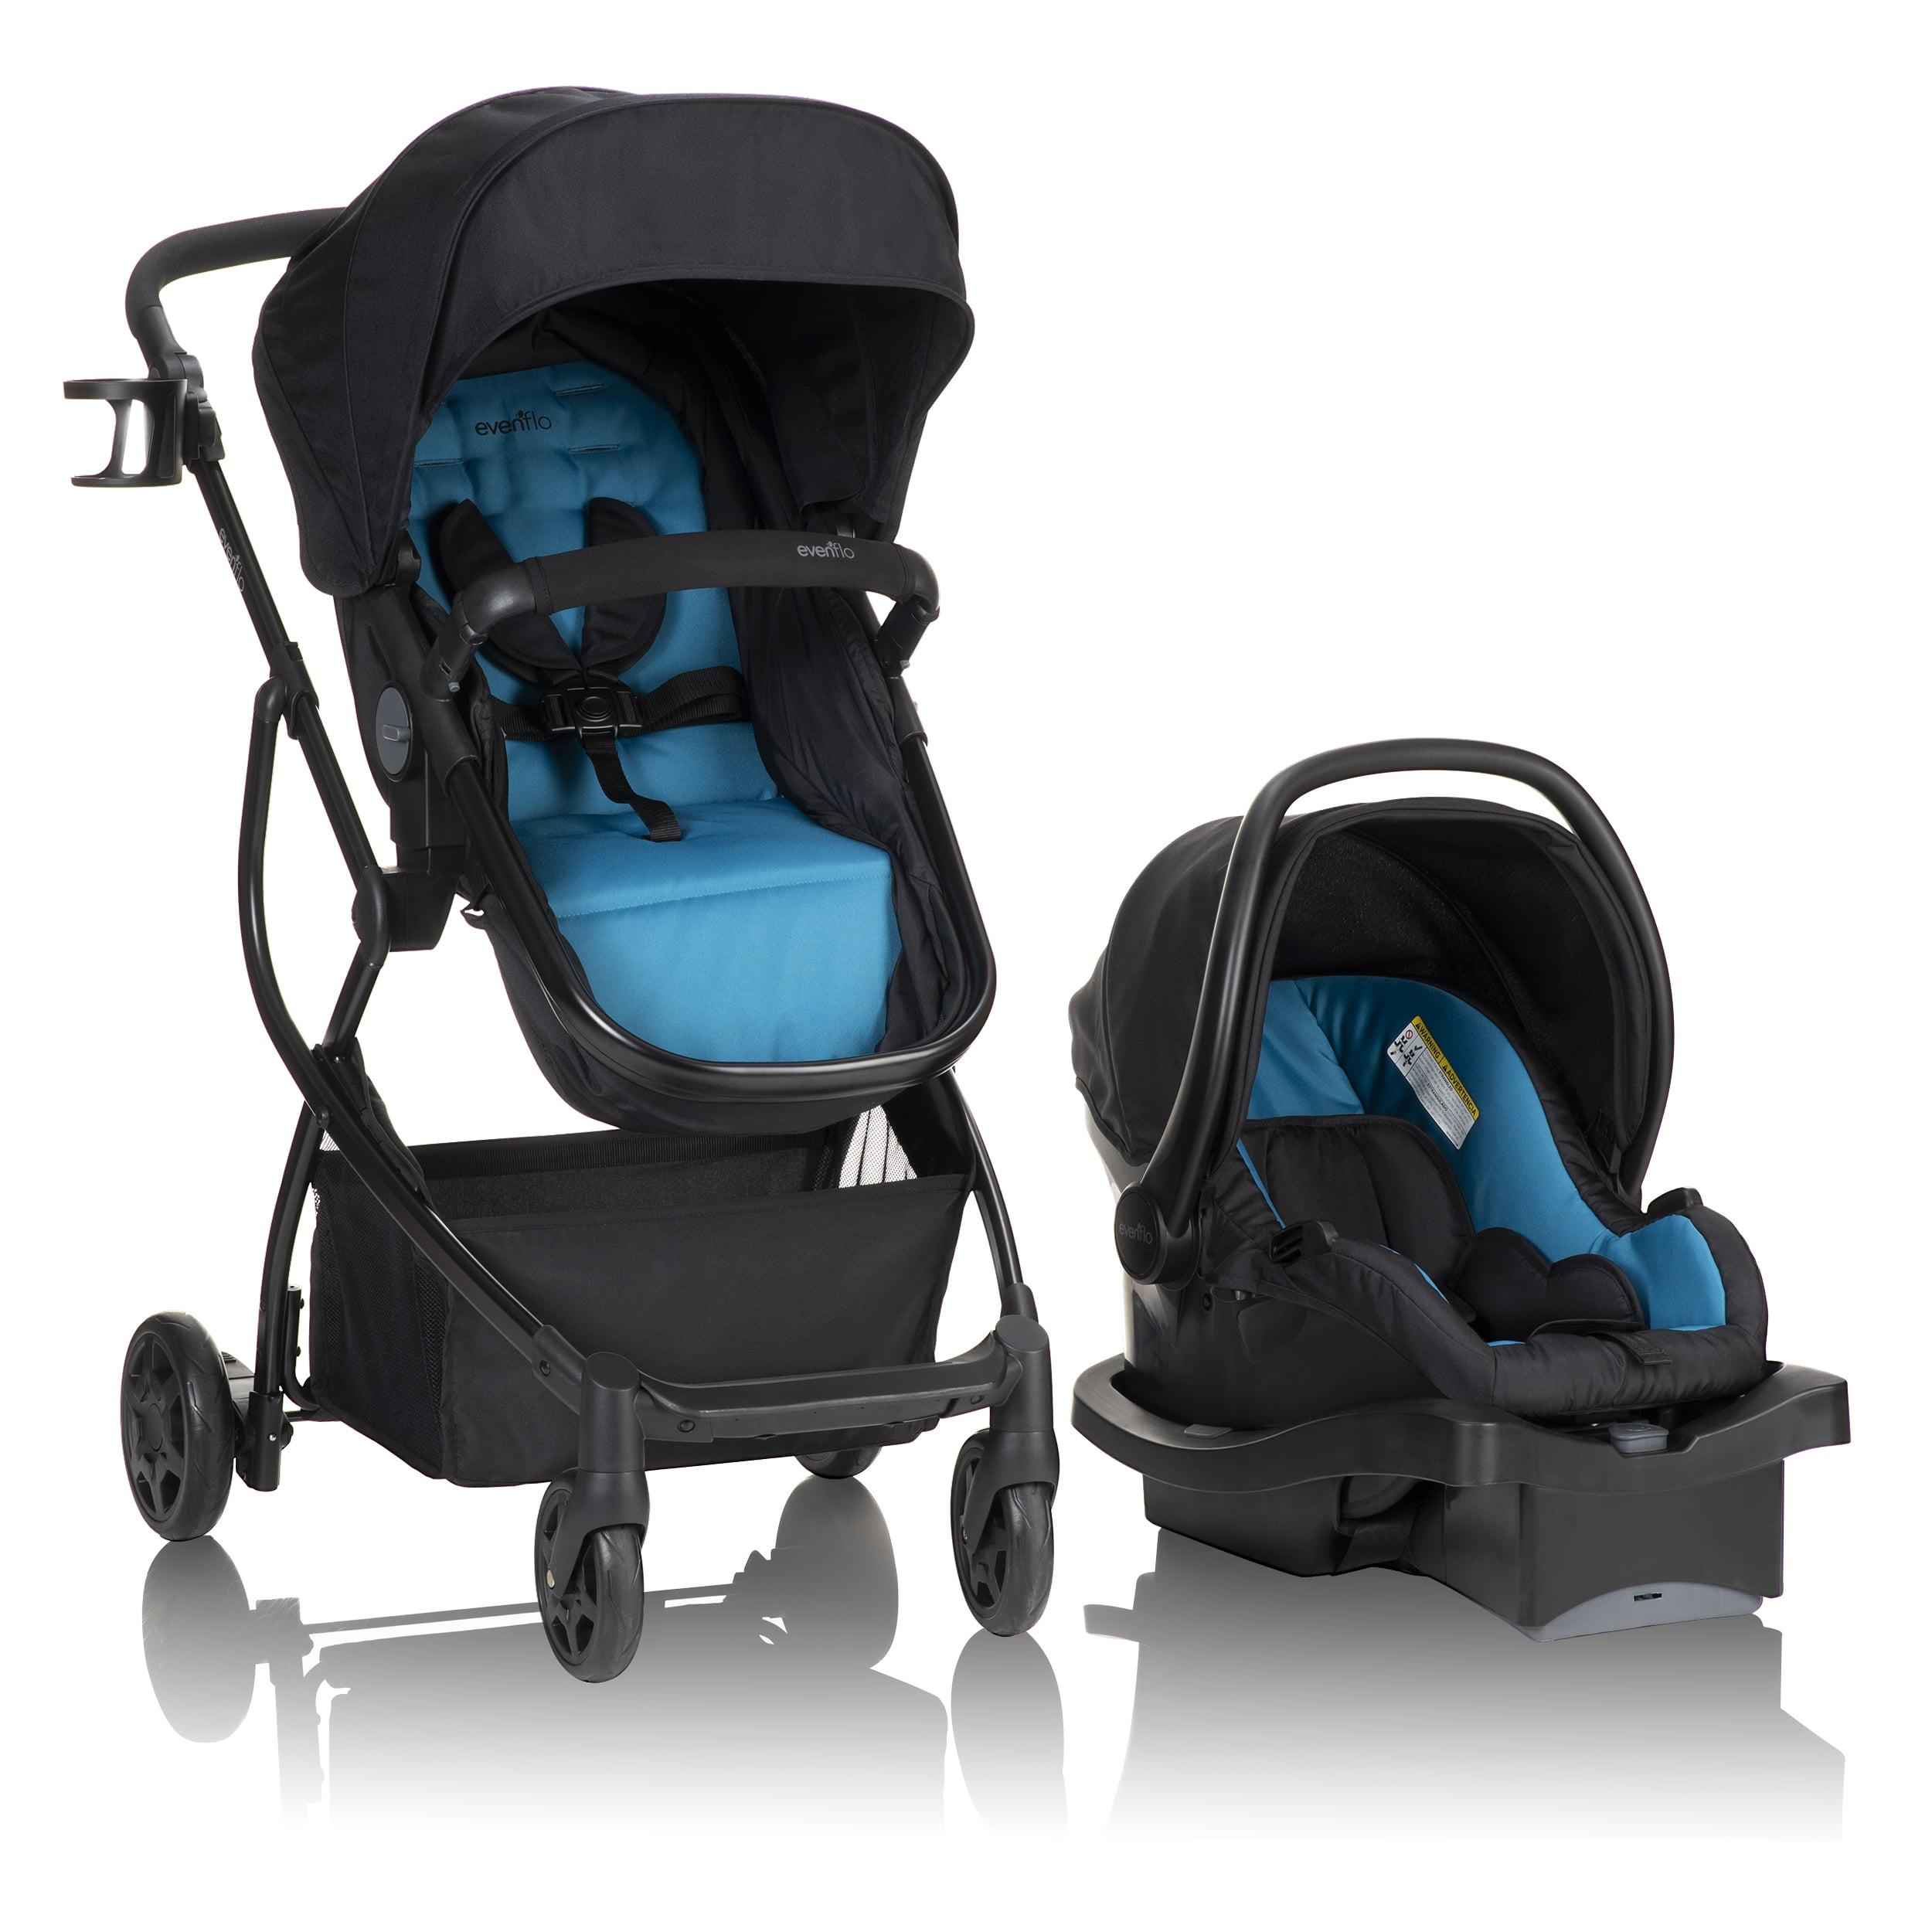 Evenflo Urbini Omni Plus Travel System with LiteMax Infant ...